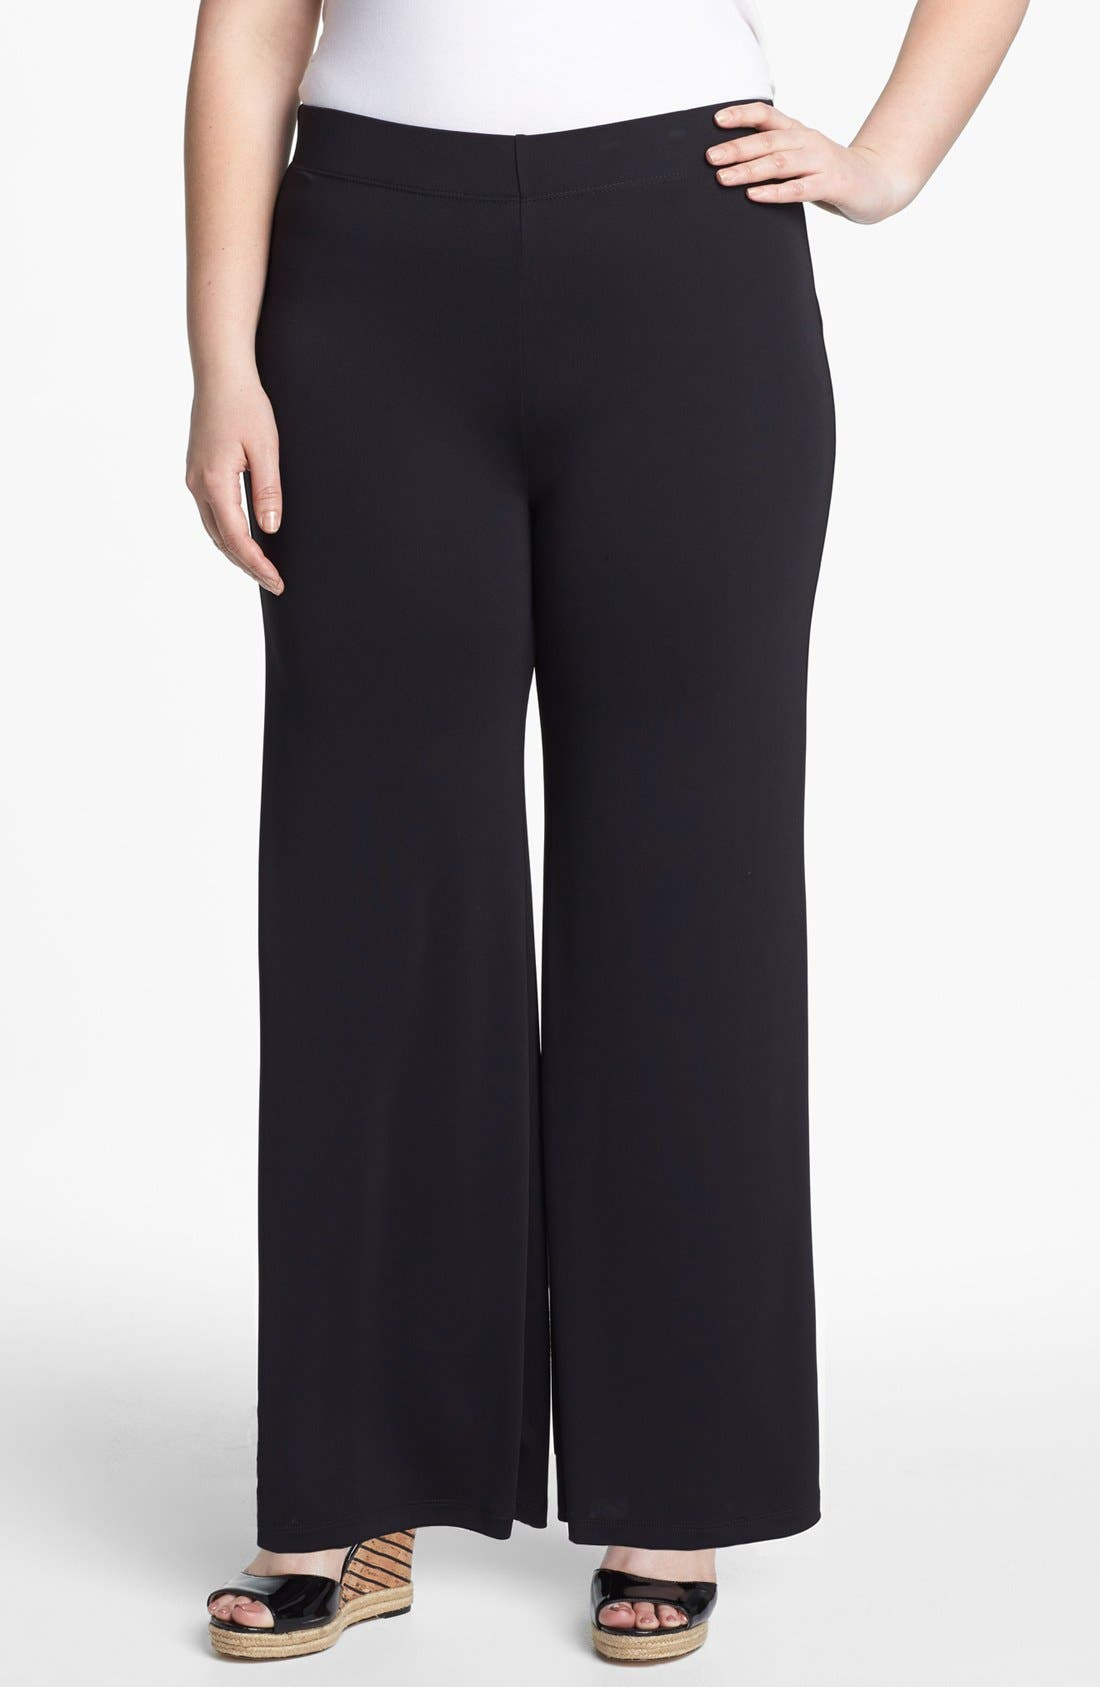 Alternate Image 1 Selected - Evans Wide Leg Pants (Plus Size)